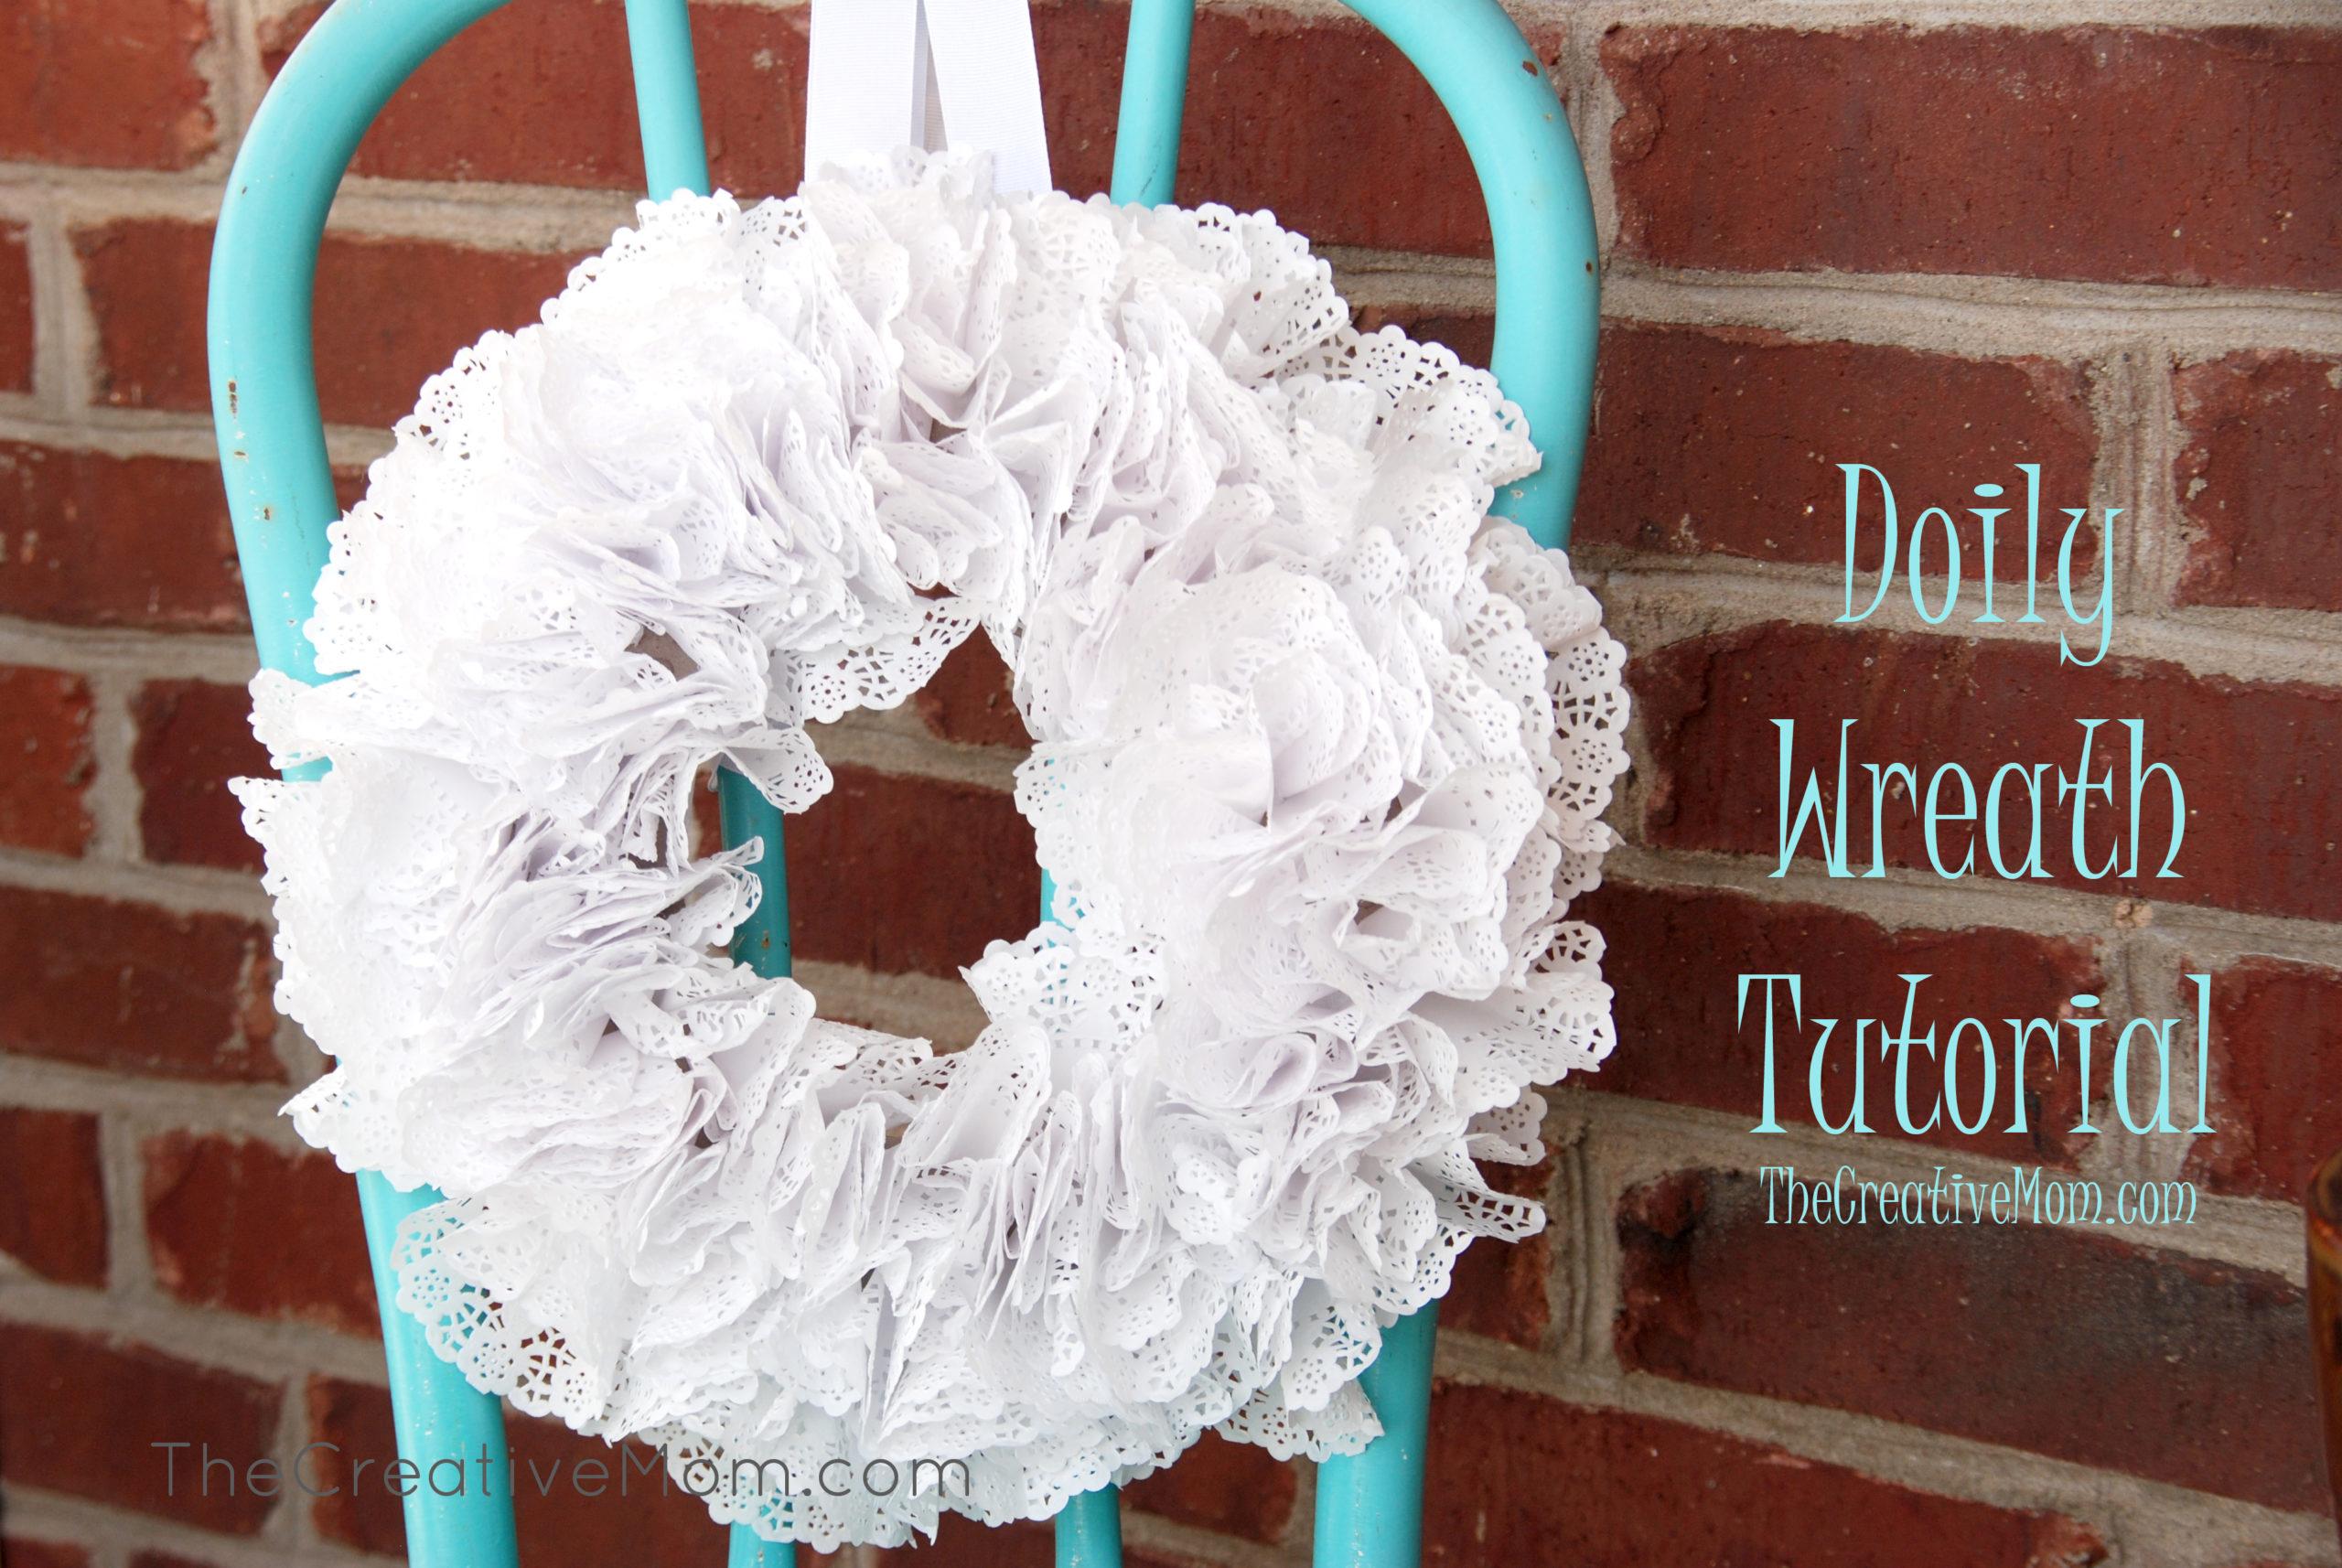 Doily Wreath Tutorial